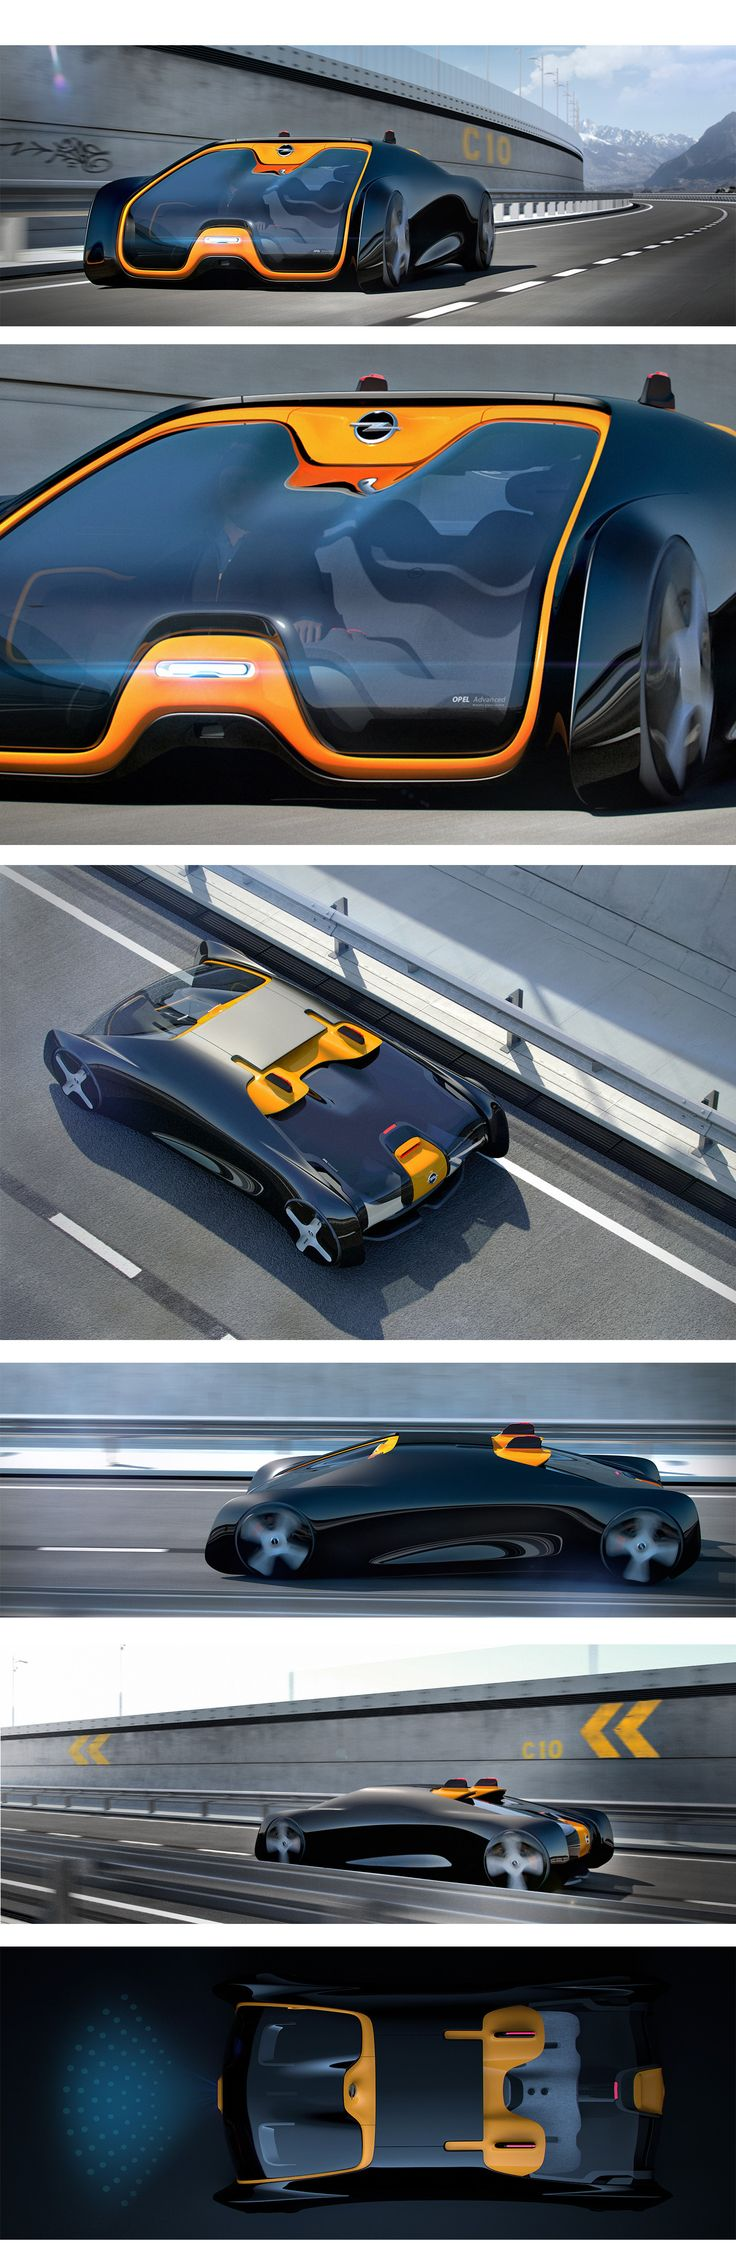 First semester project for Pforzheim University sponsored by Opel.Opel H is a…